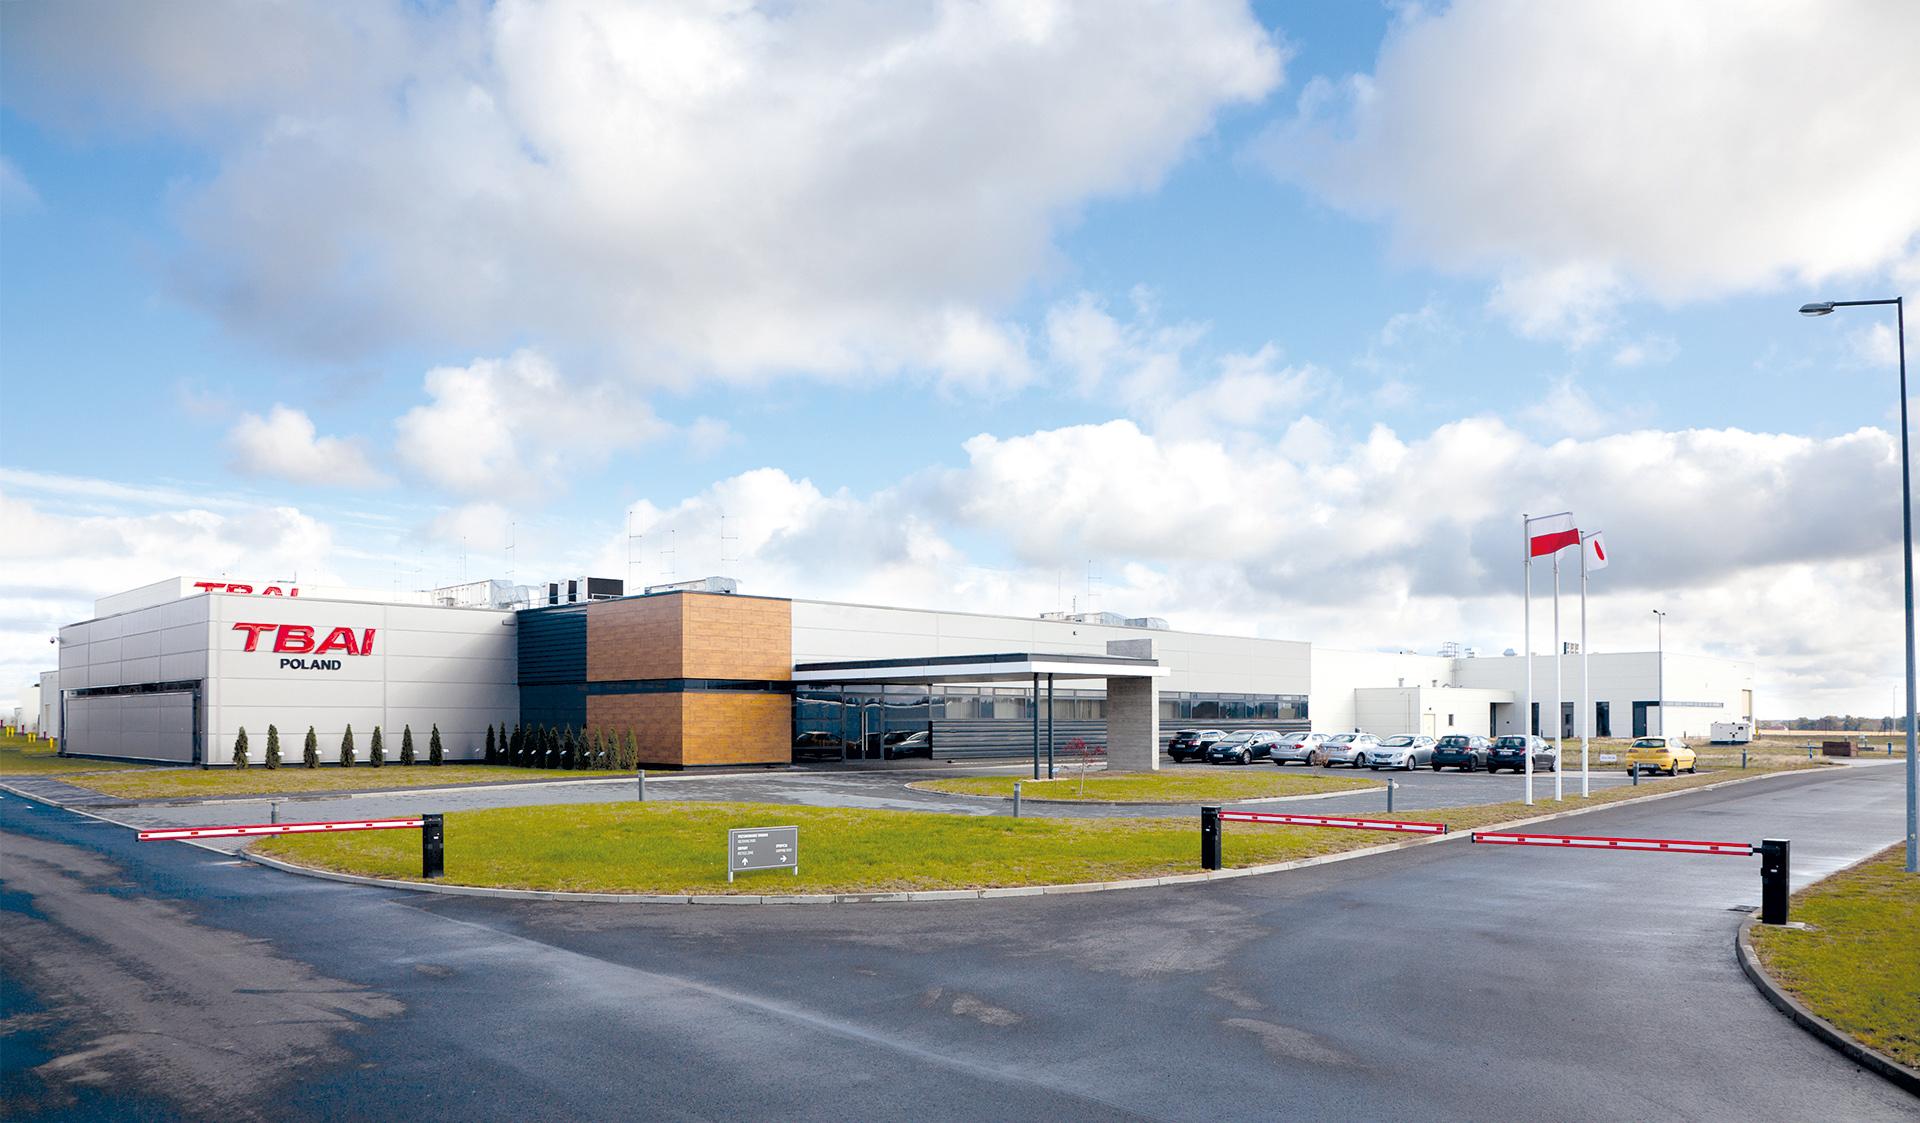 TBAI car seat factory in Wykroty Poland built by Takenaka Europe